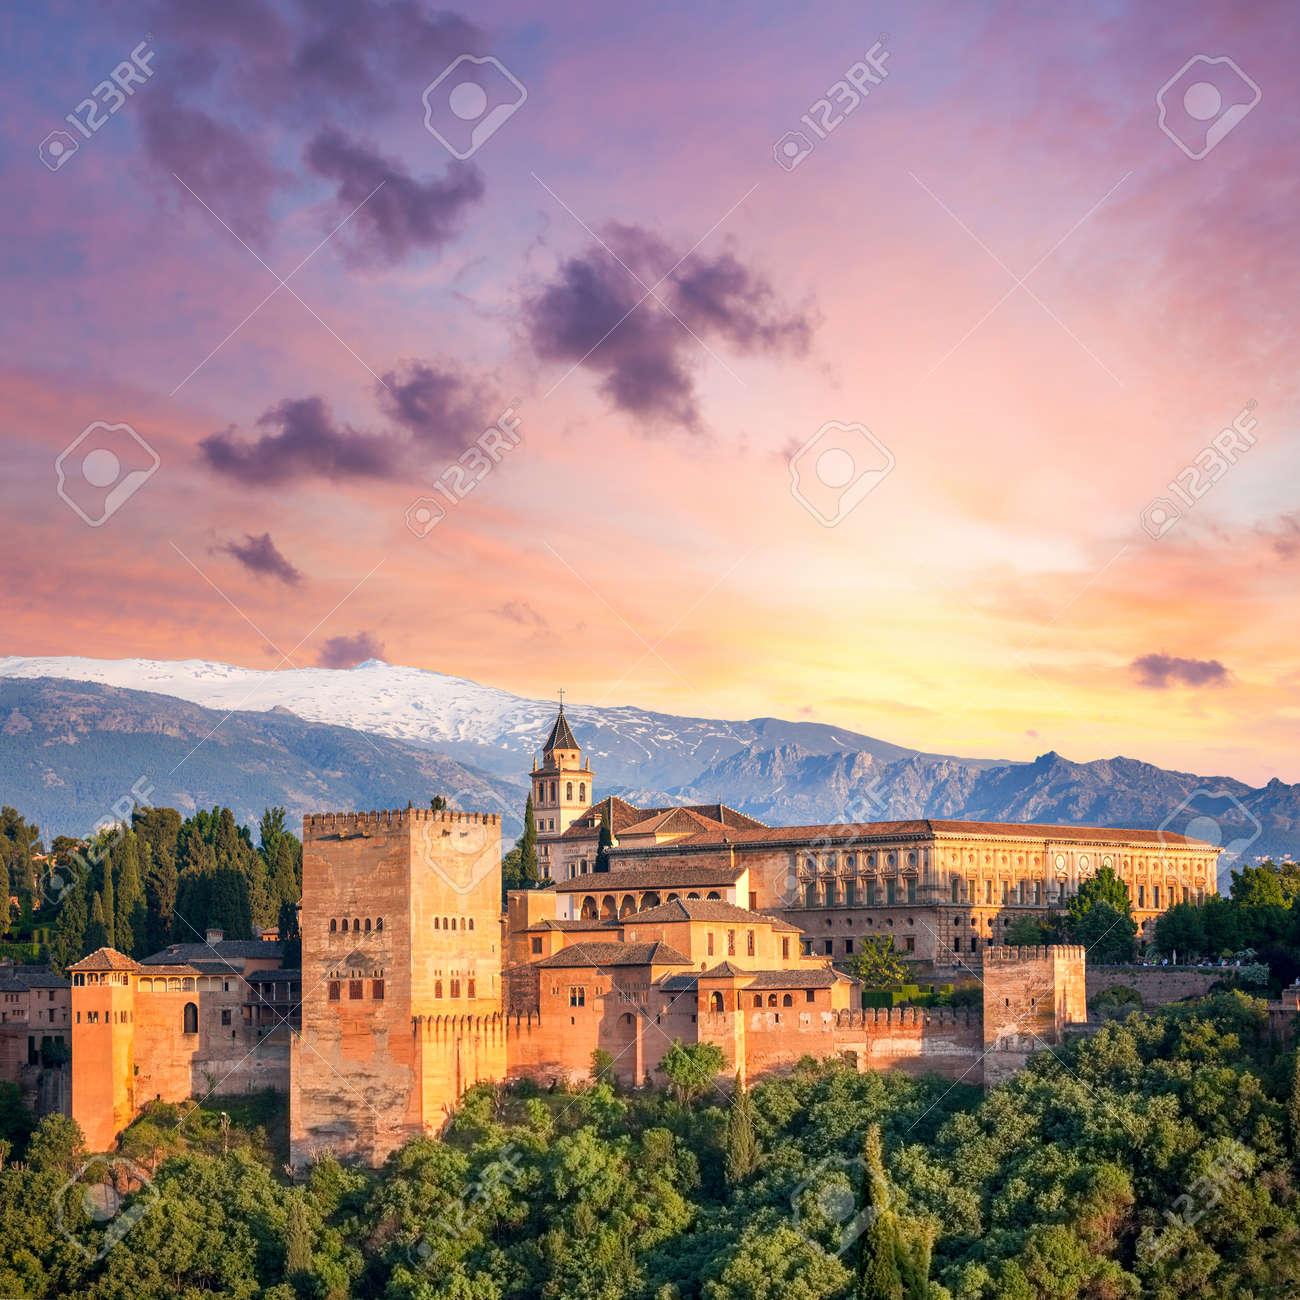 Fantastic Ancient Alhambra at thel evening time, Granada, Spain, European travel landmark - 51925924